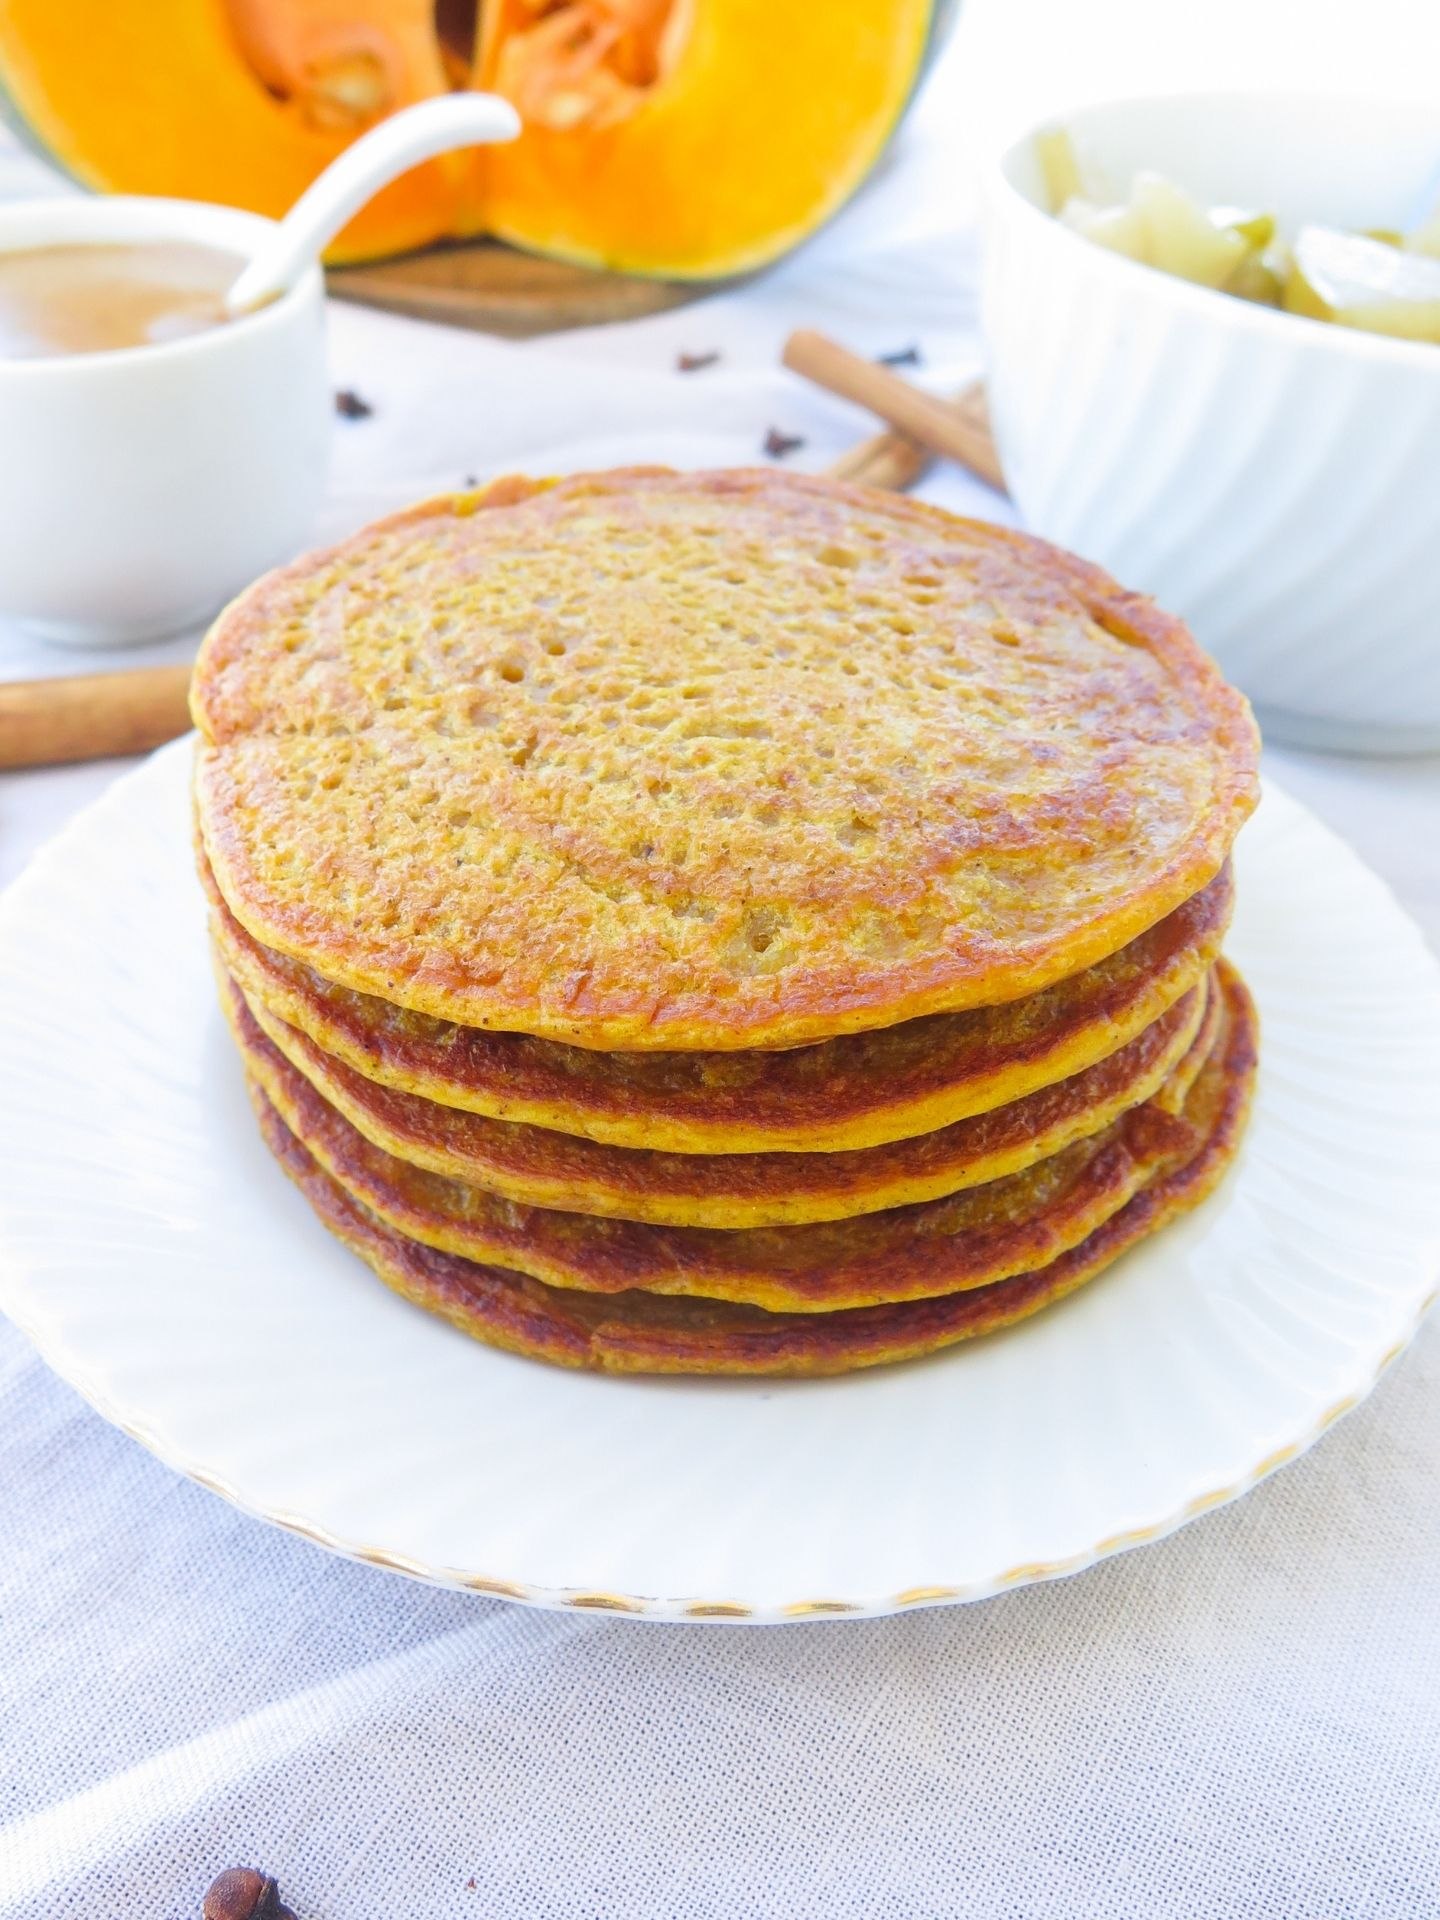 Kürbis Pancakes Stapel ohne Toppings